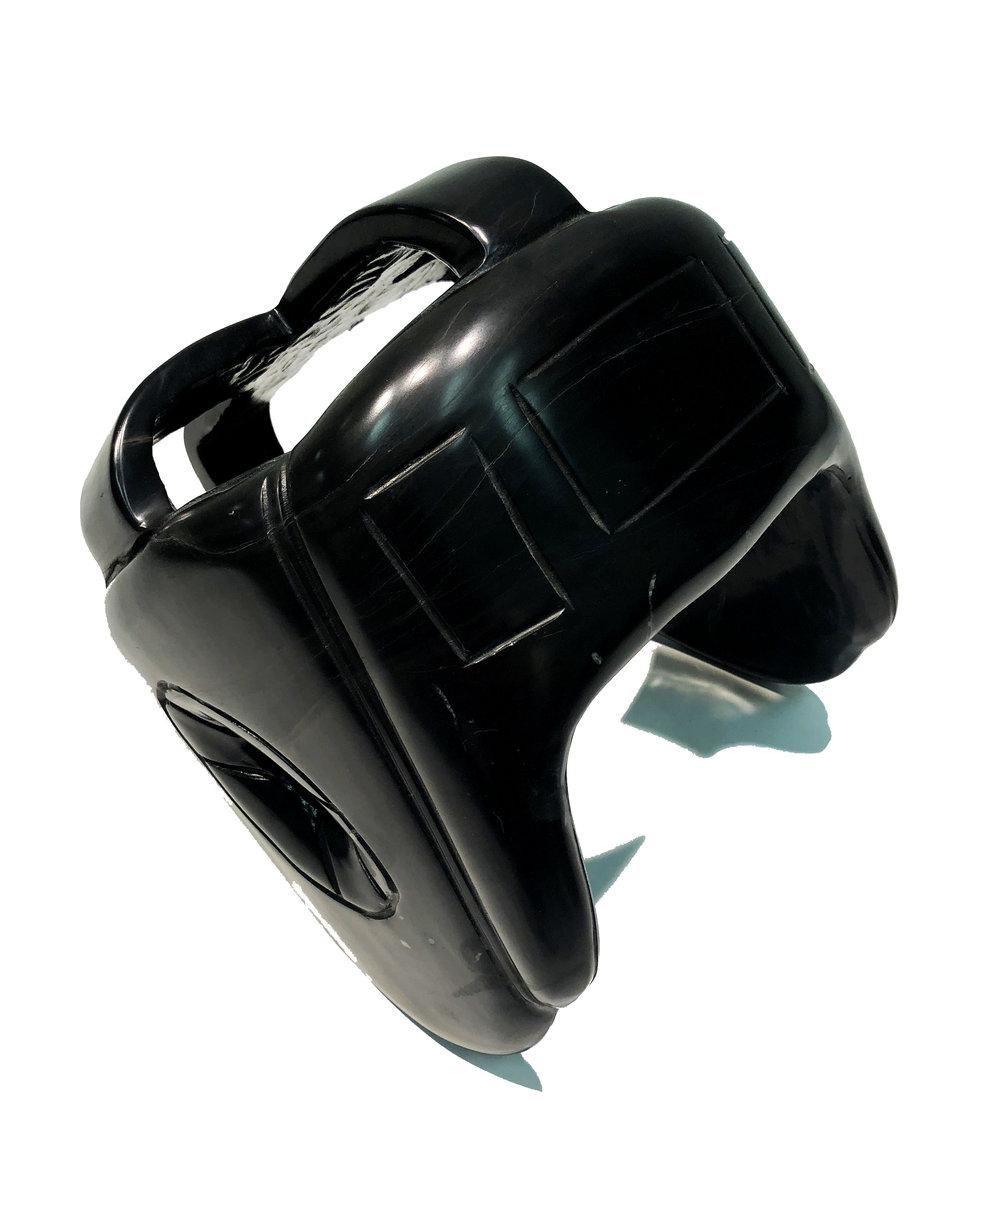 KL_Boxing Gear_Black Marble_23x23x23cm03.jpg